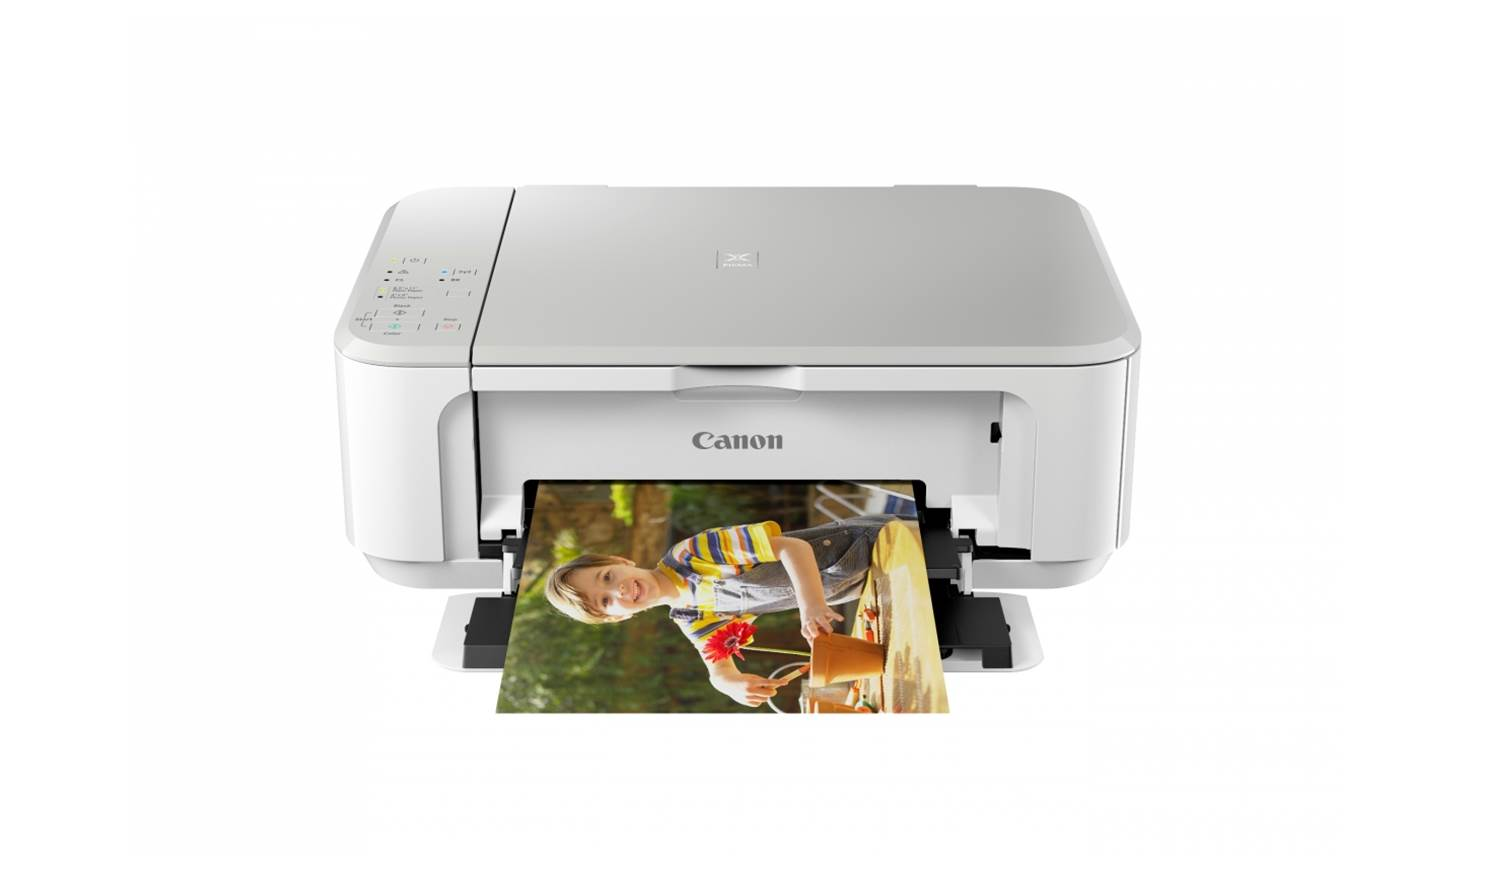 Canon PIXMA MG-3670 All-in-One Printer - White | Harvey Norman Singapore